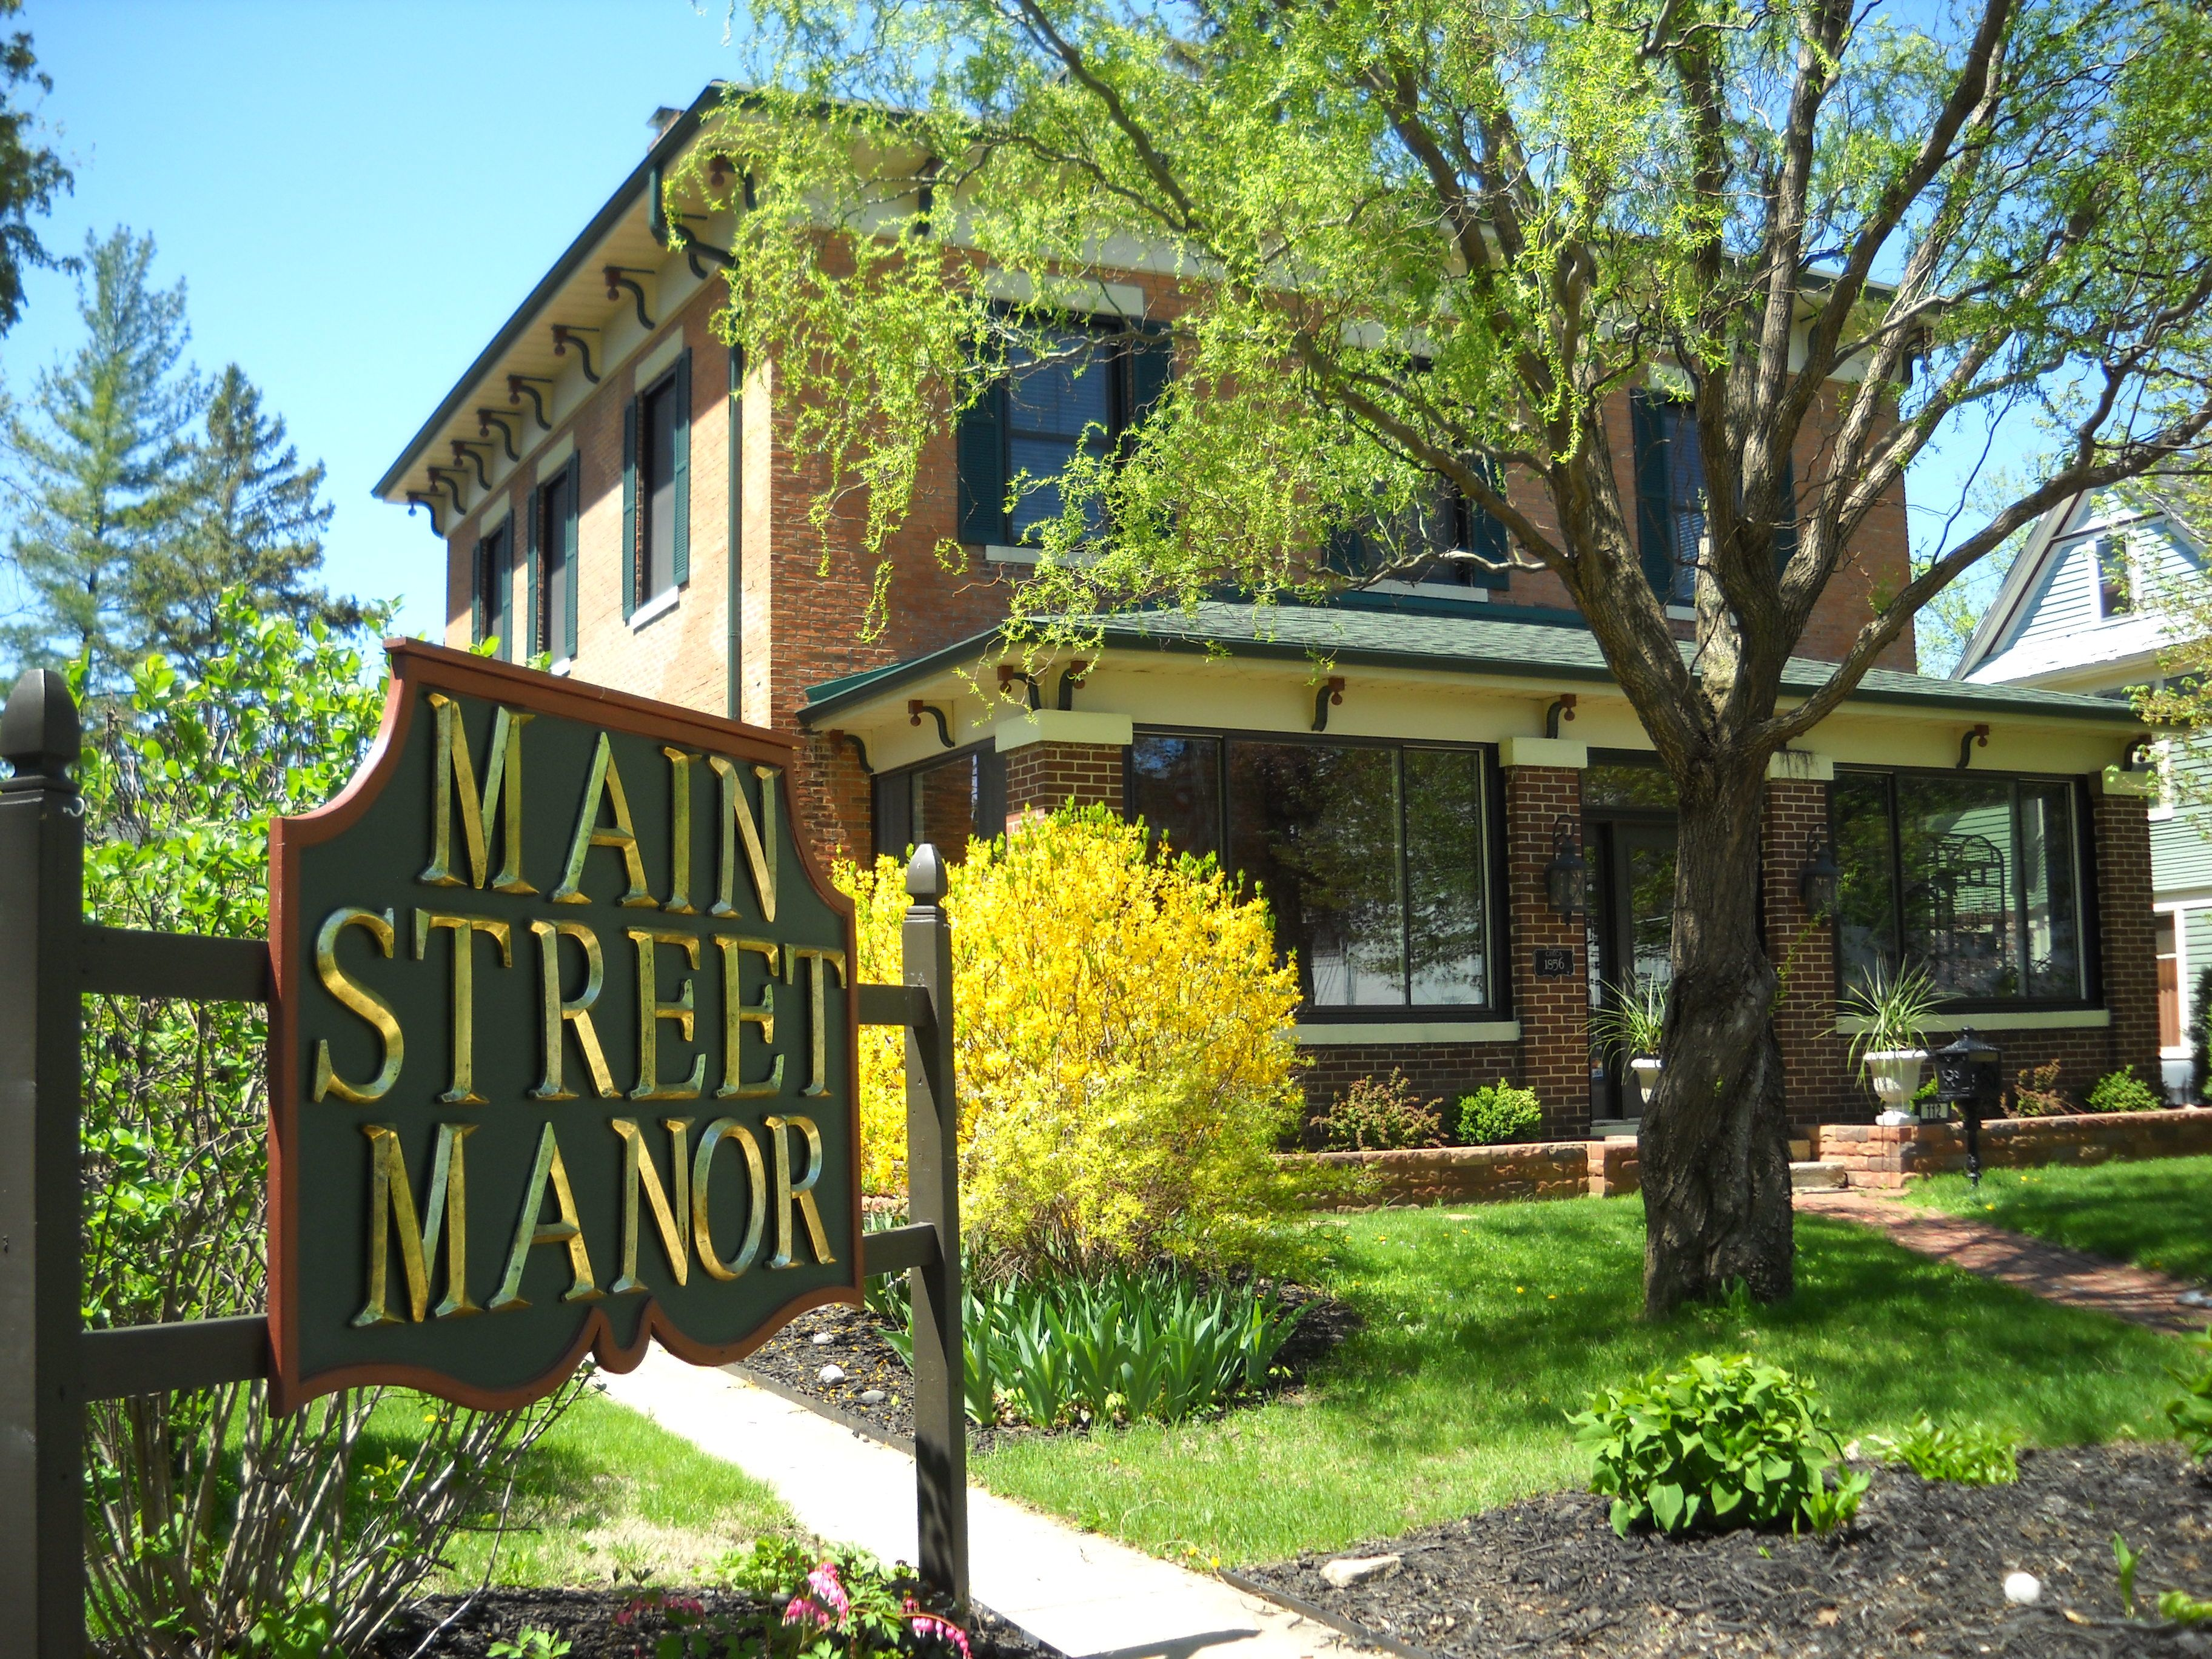 Main Street Manor bed & breakfast in downtown Delavan